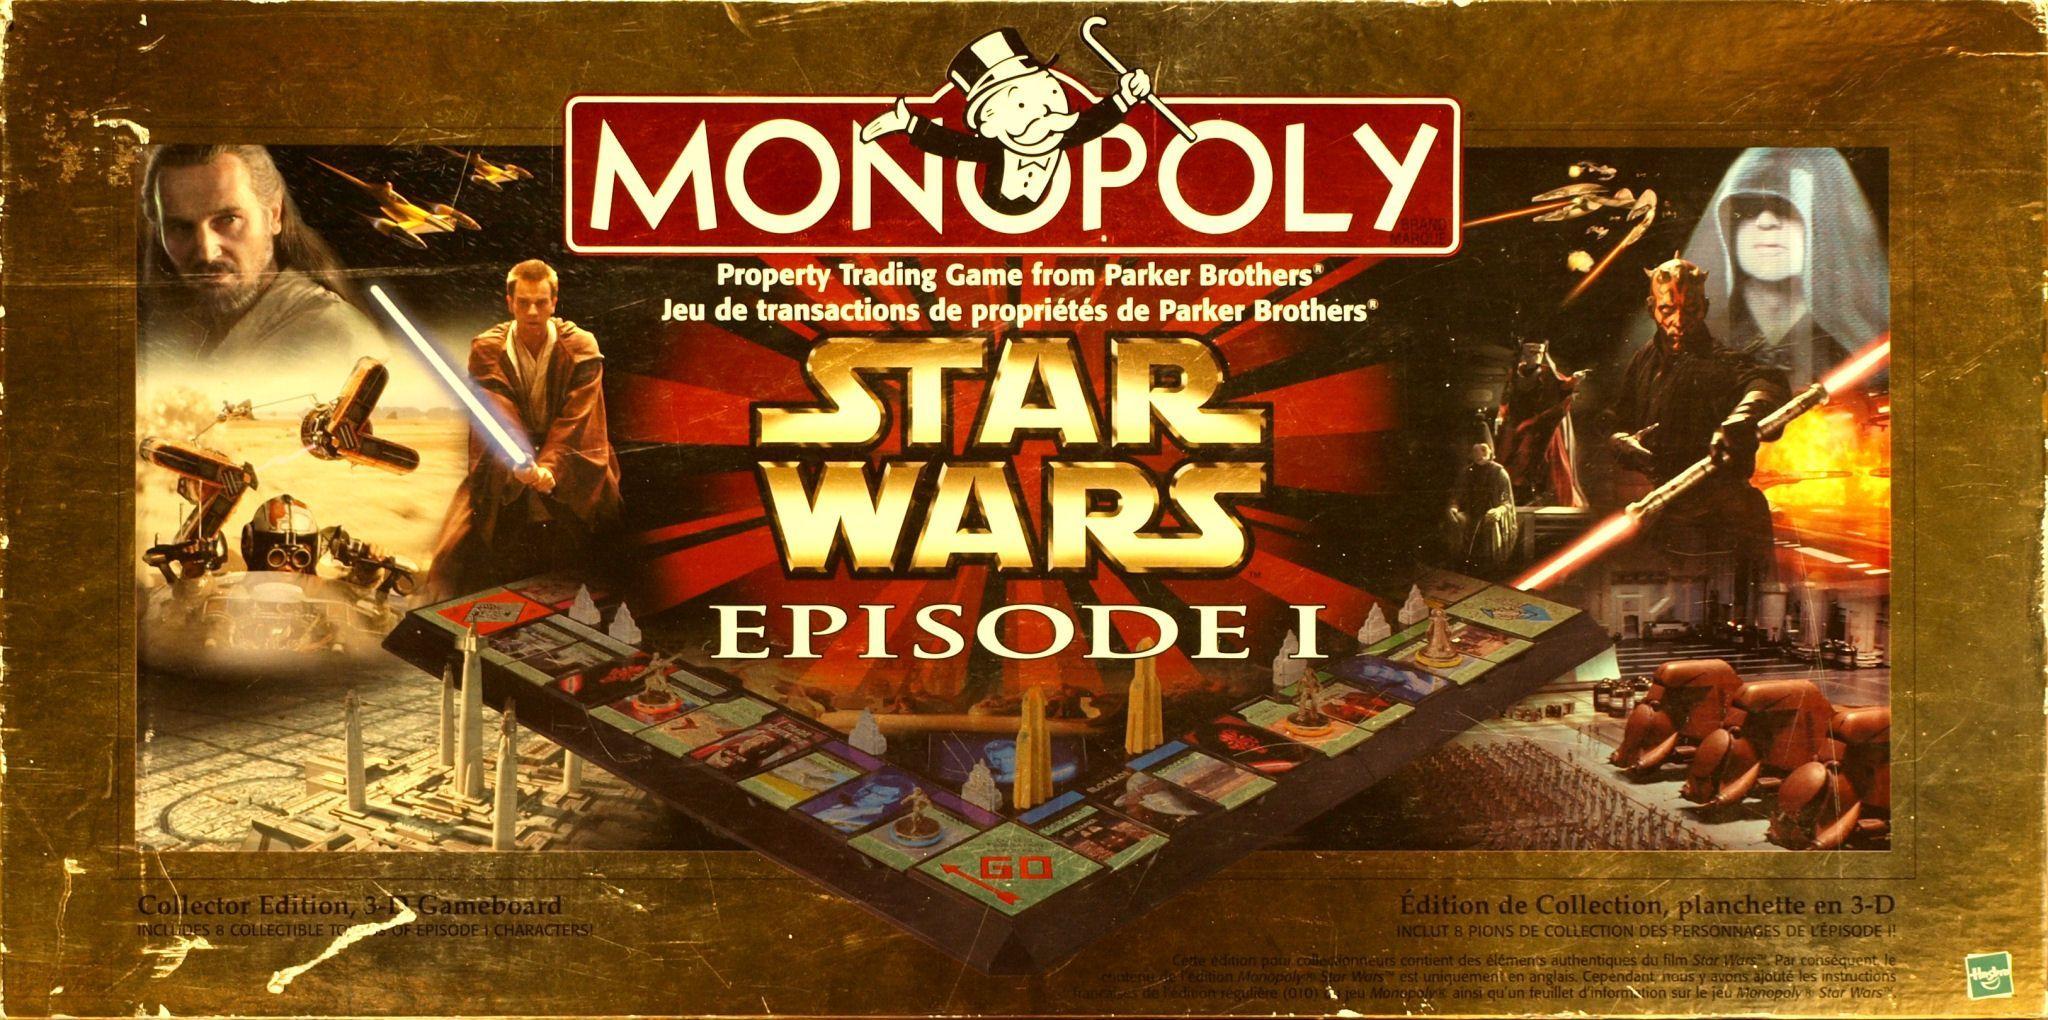 Monopoly: Star Wars Episode I